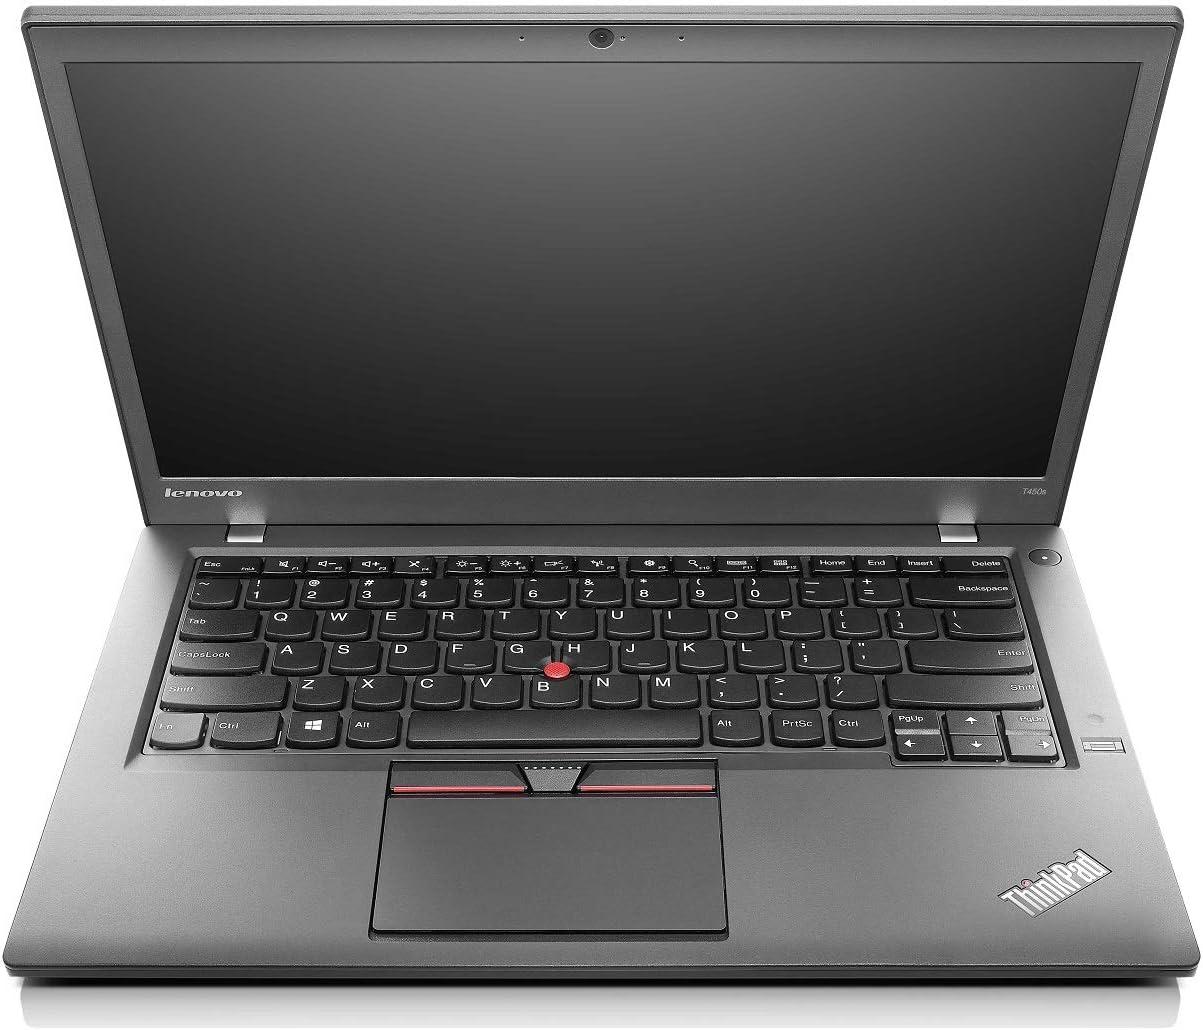 Lenovo ThinkPad T450s 14in Laptop, Intel Core i5 5300U 2.3Ghz, 8GB DDR3 RAM, 256GB SSD Hard Drive, Webcam, Windows 10 (Renewed)